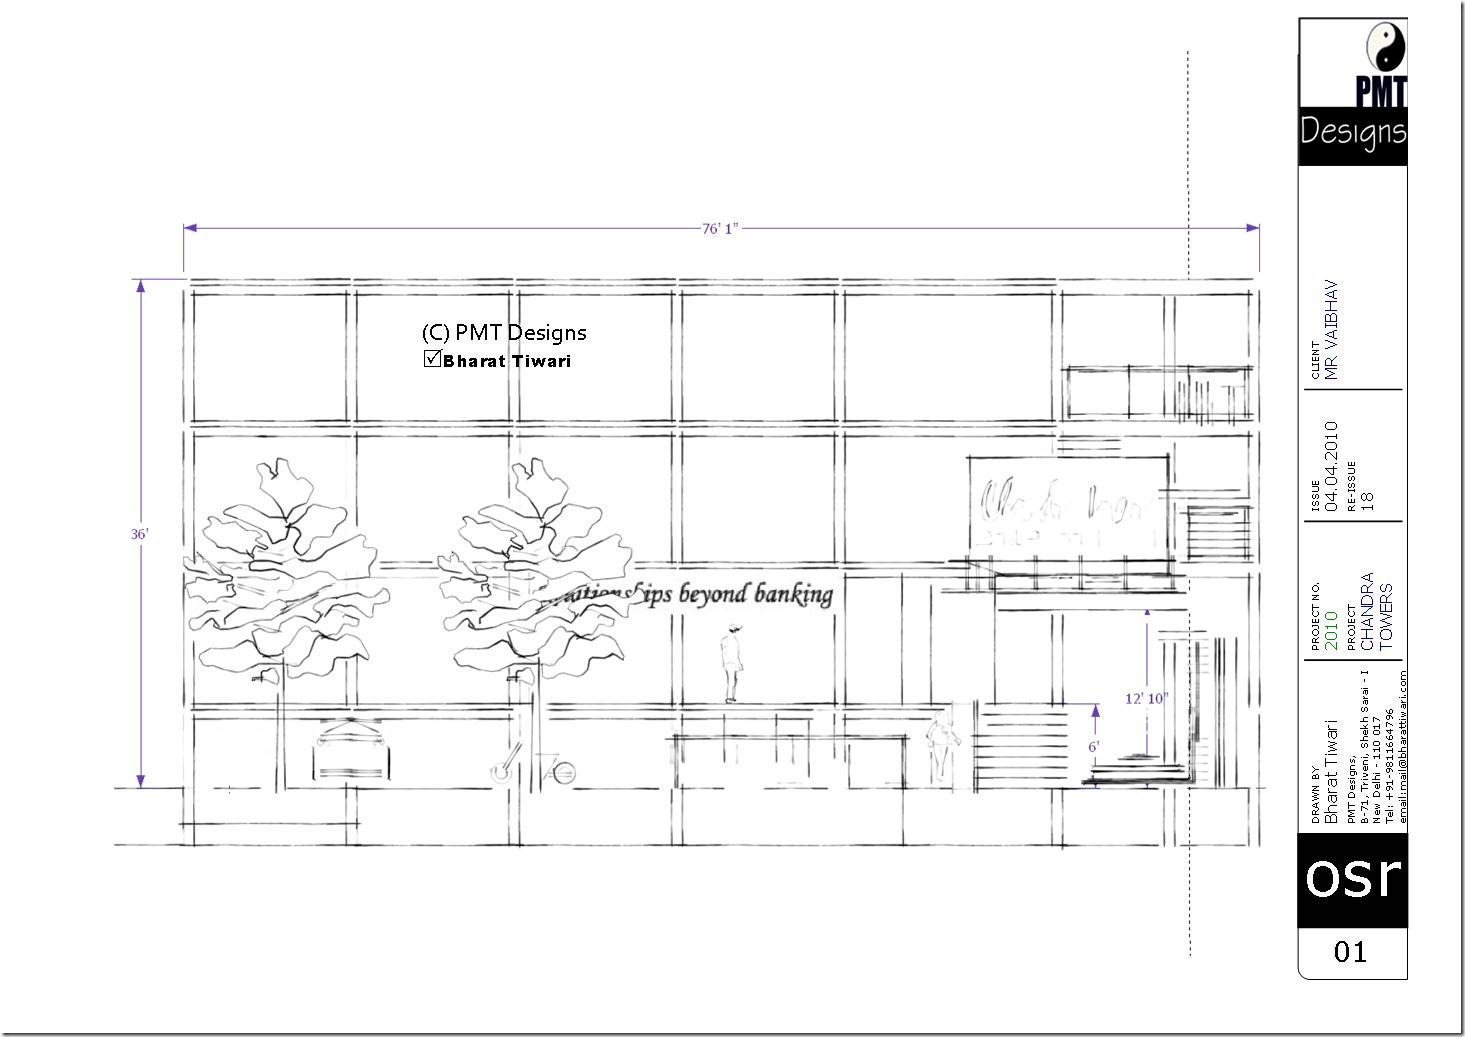 osr pmt varun1 chandra business centre concept bharat tiwari_02